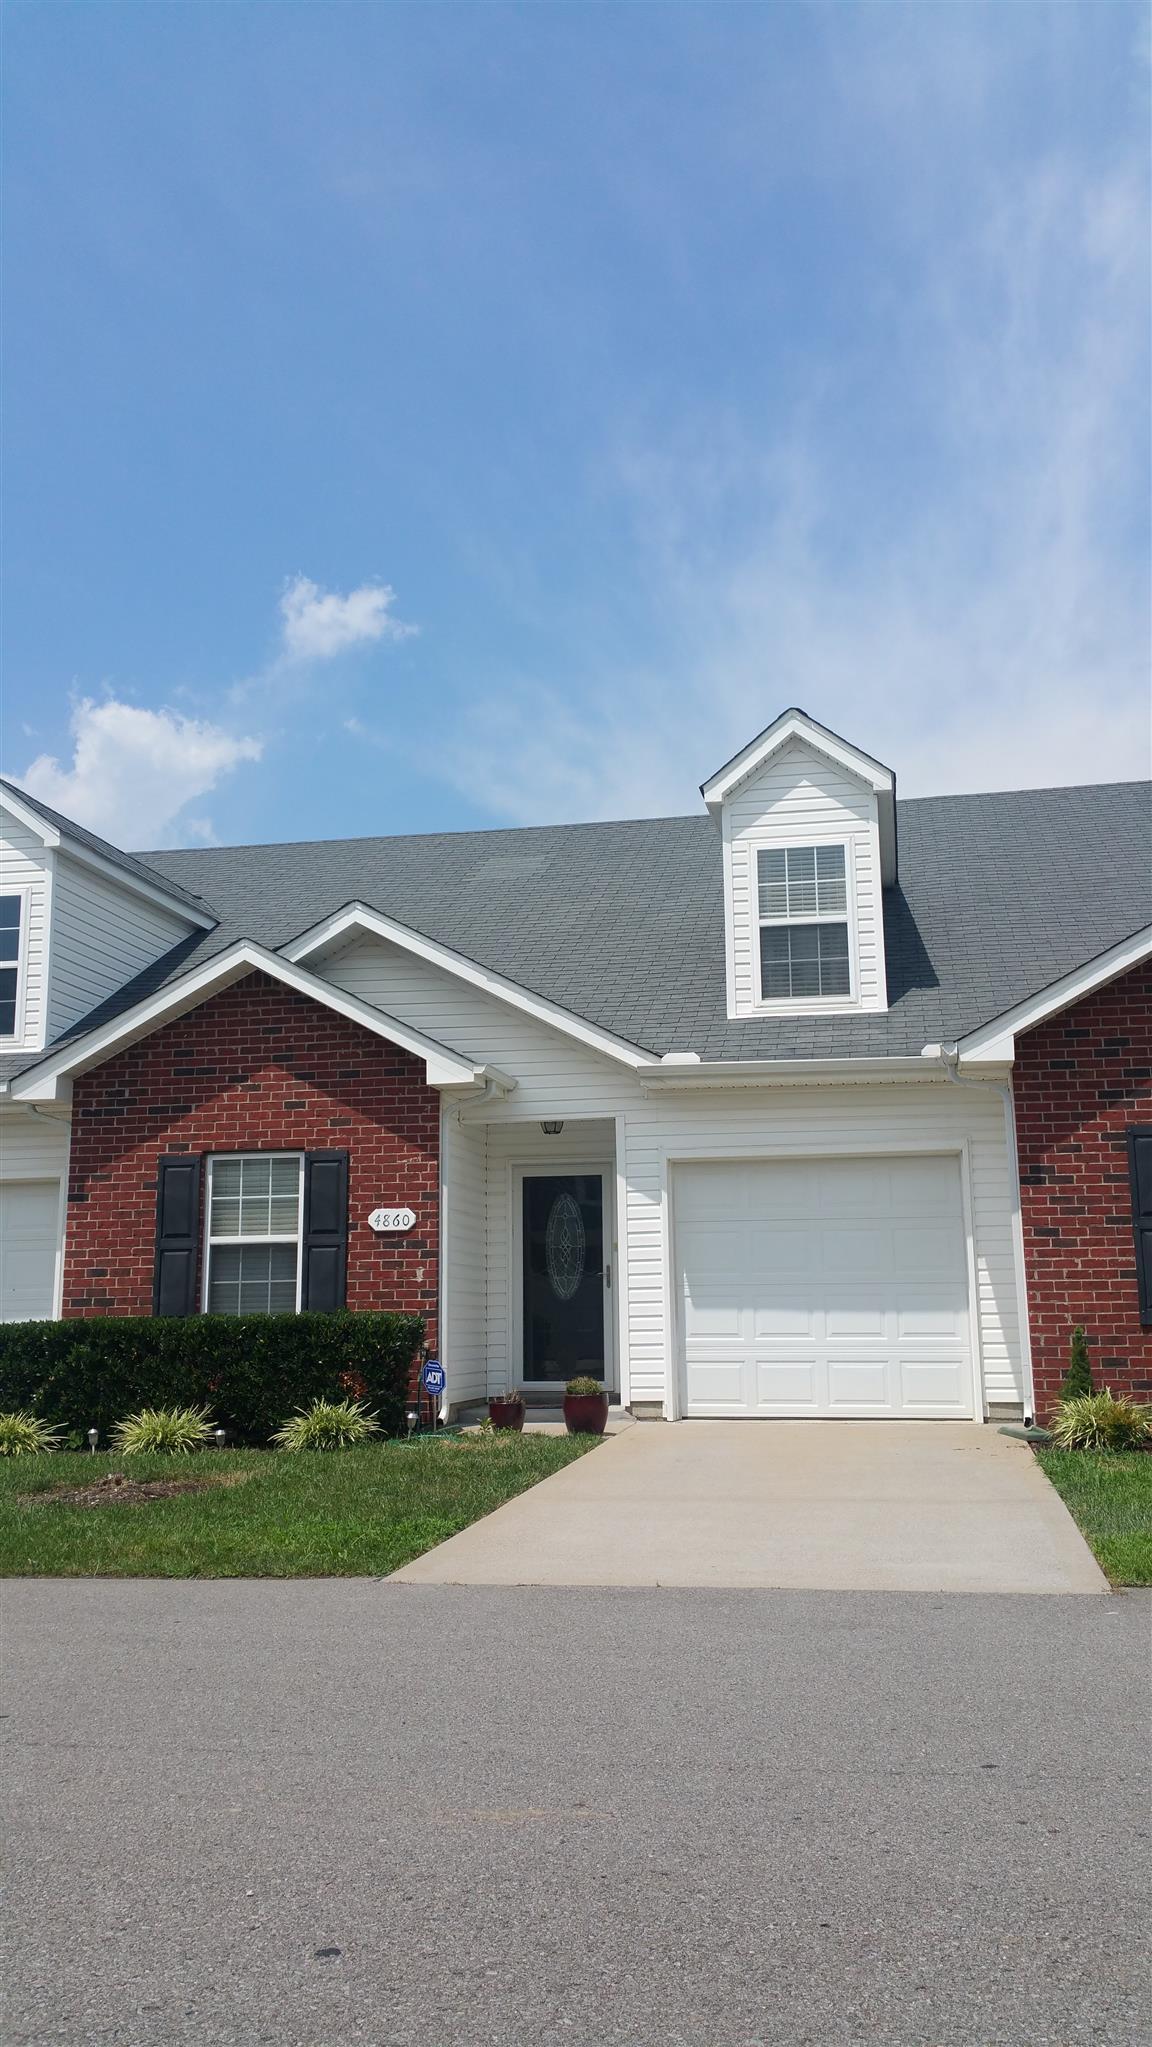 4860 Chelanie Cir, Murfreesboro, TN 37129